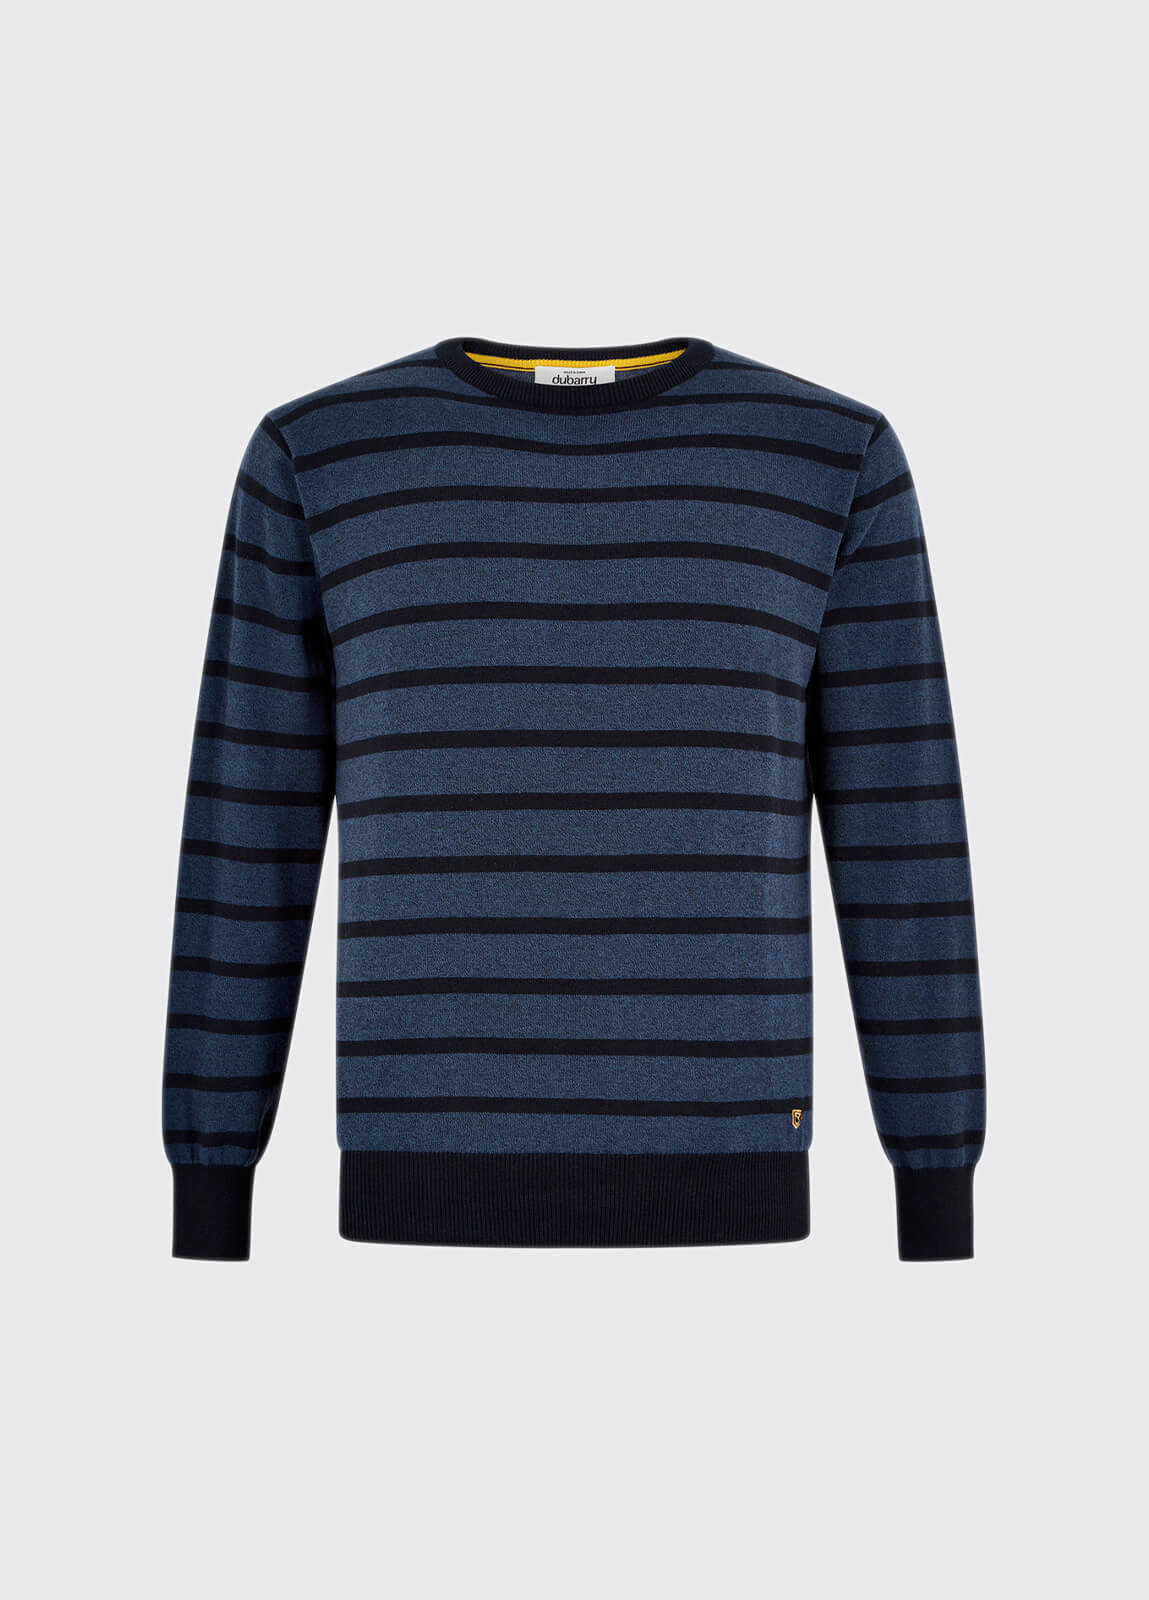 Avondale Sweater - Navy Multi